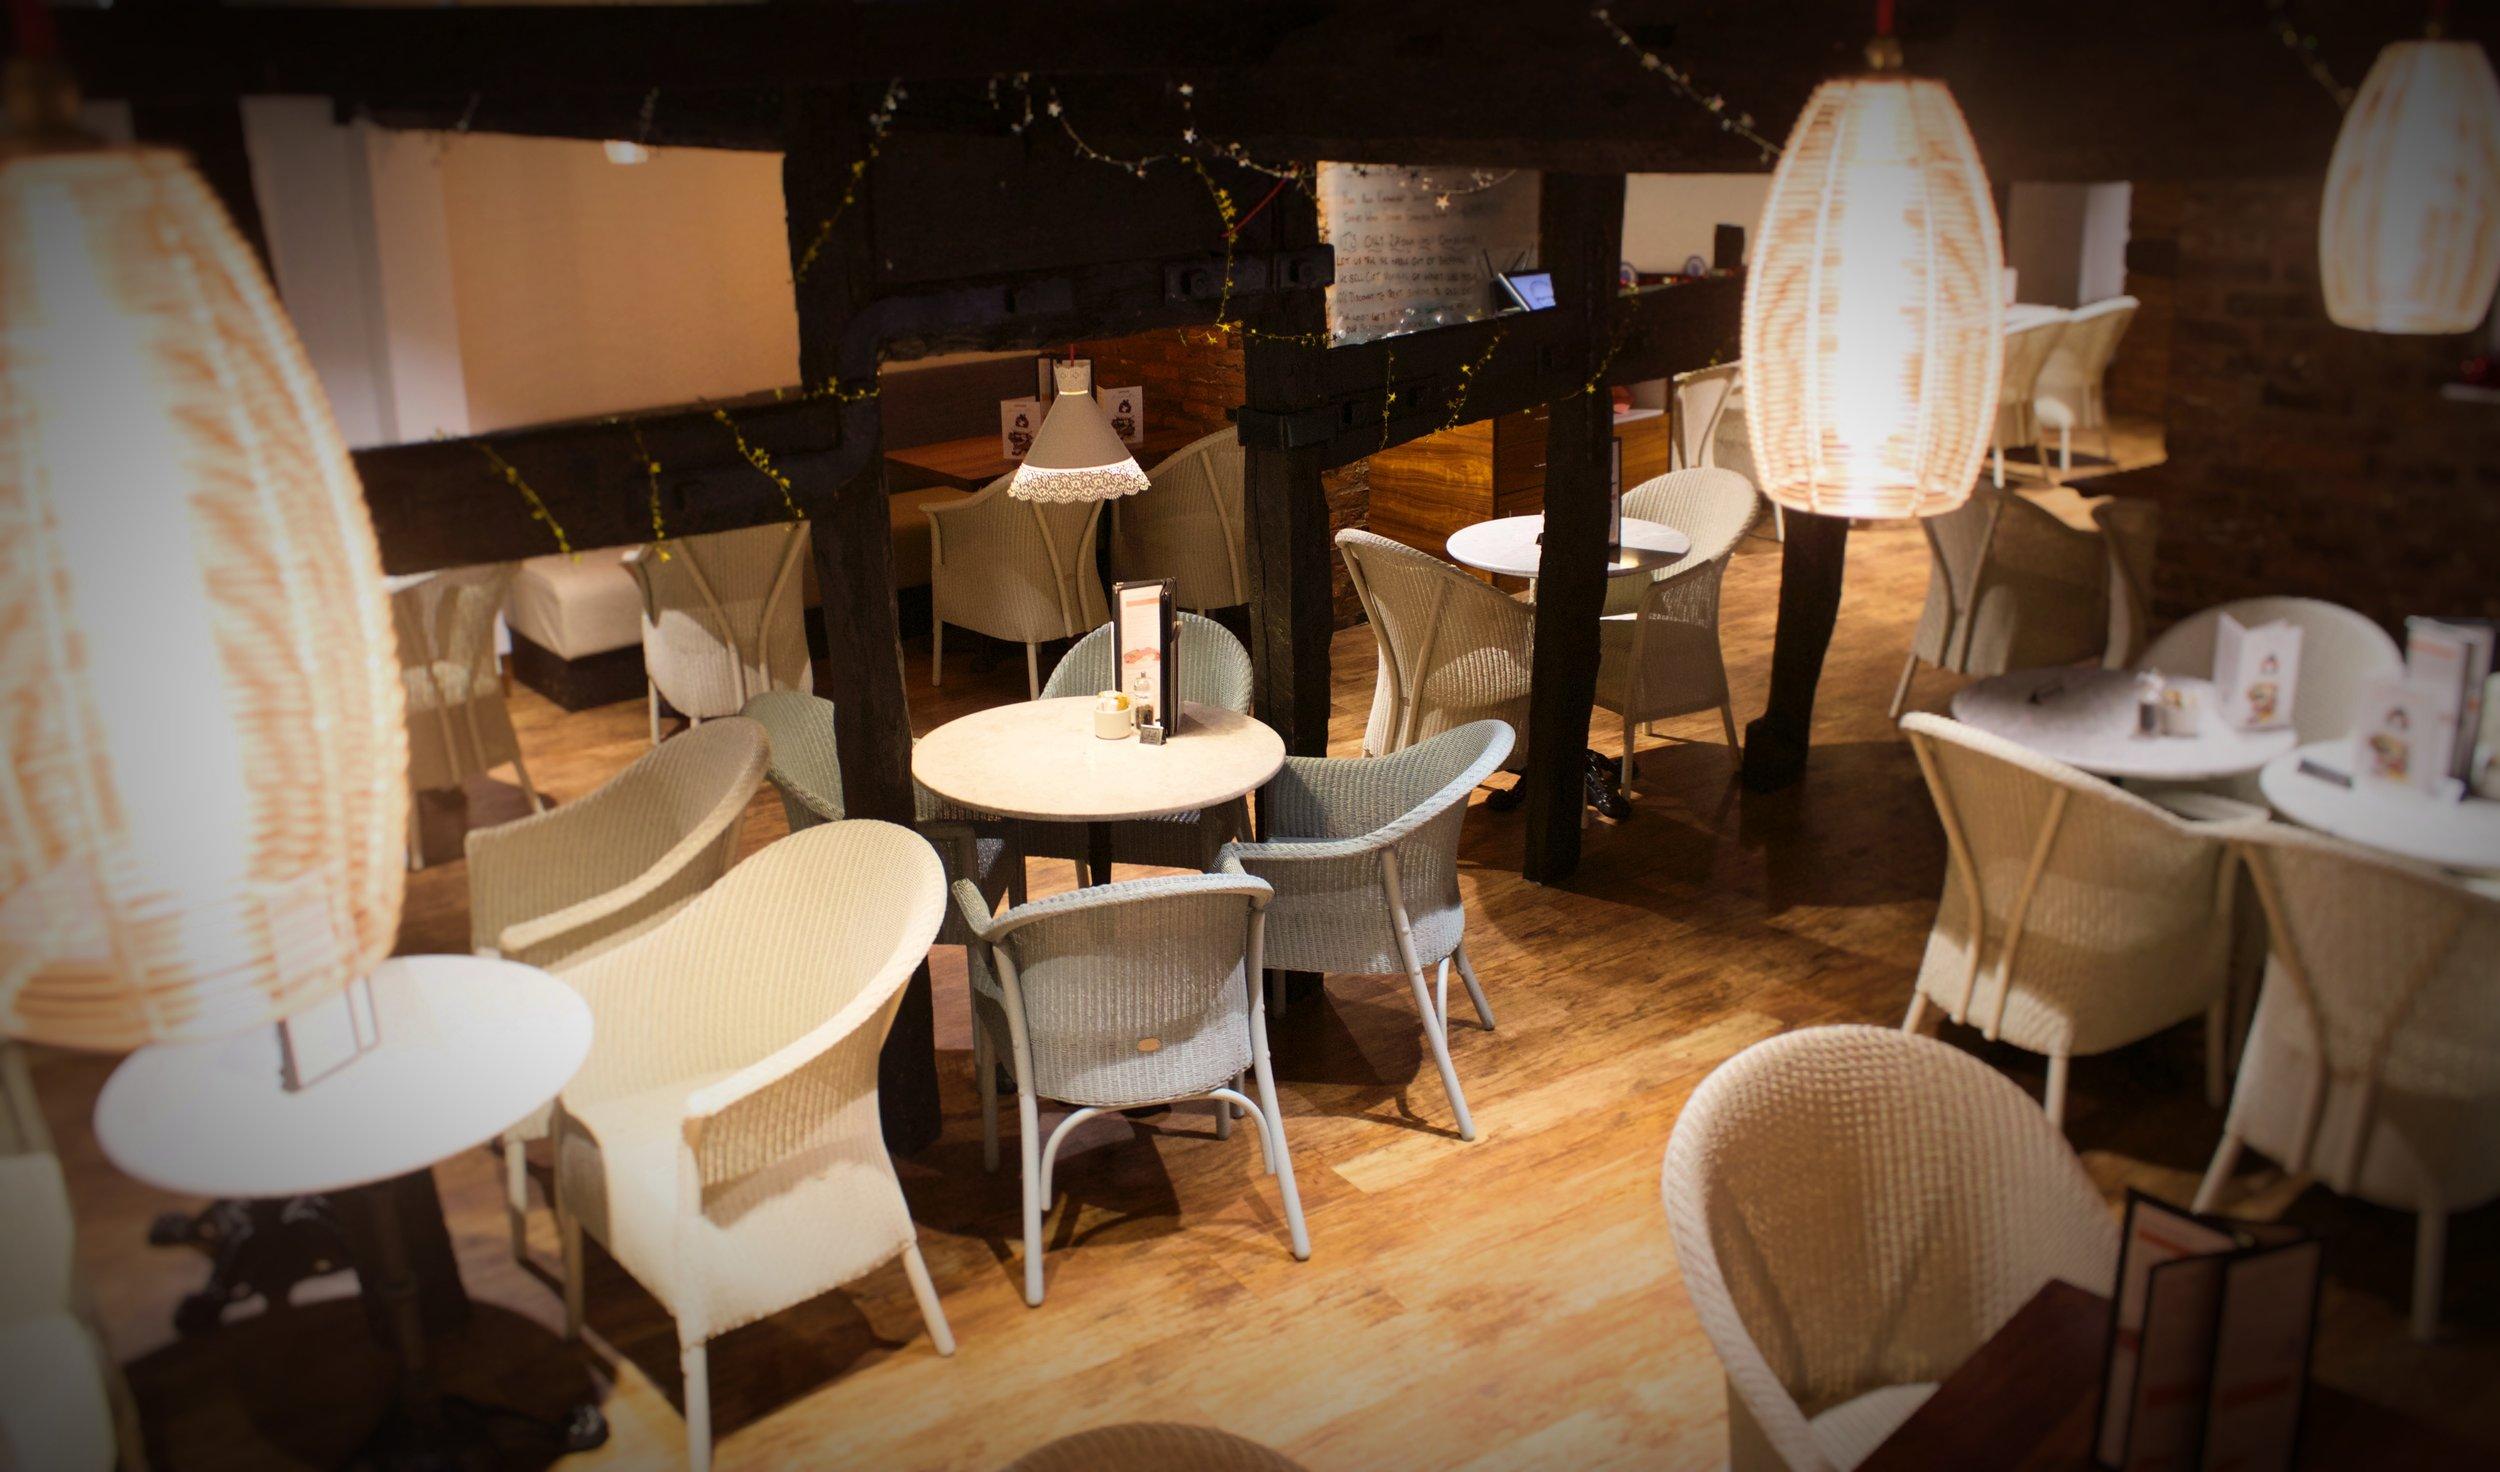 Huffkins Stratford upon Avon Restaurant & Tea Room